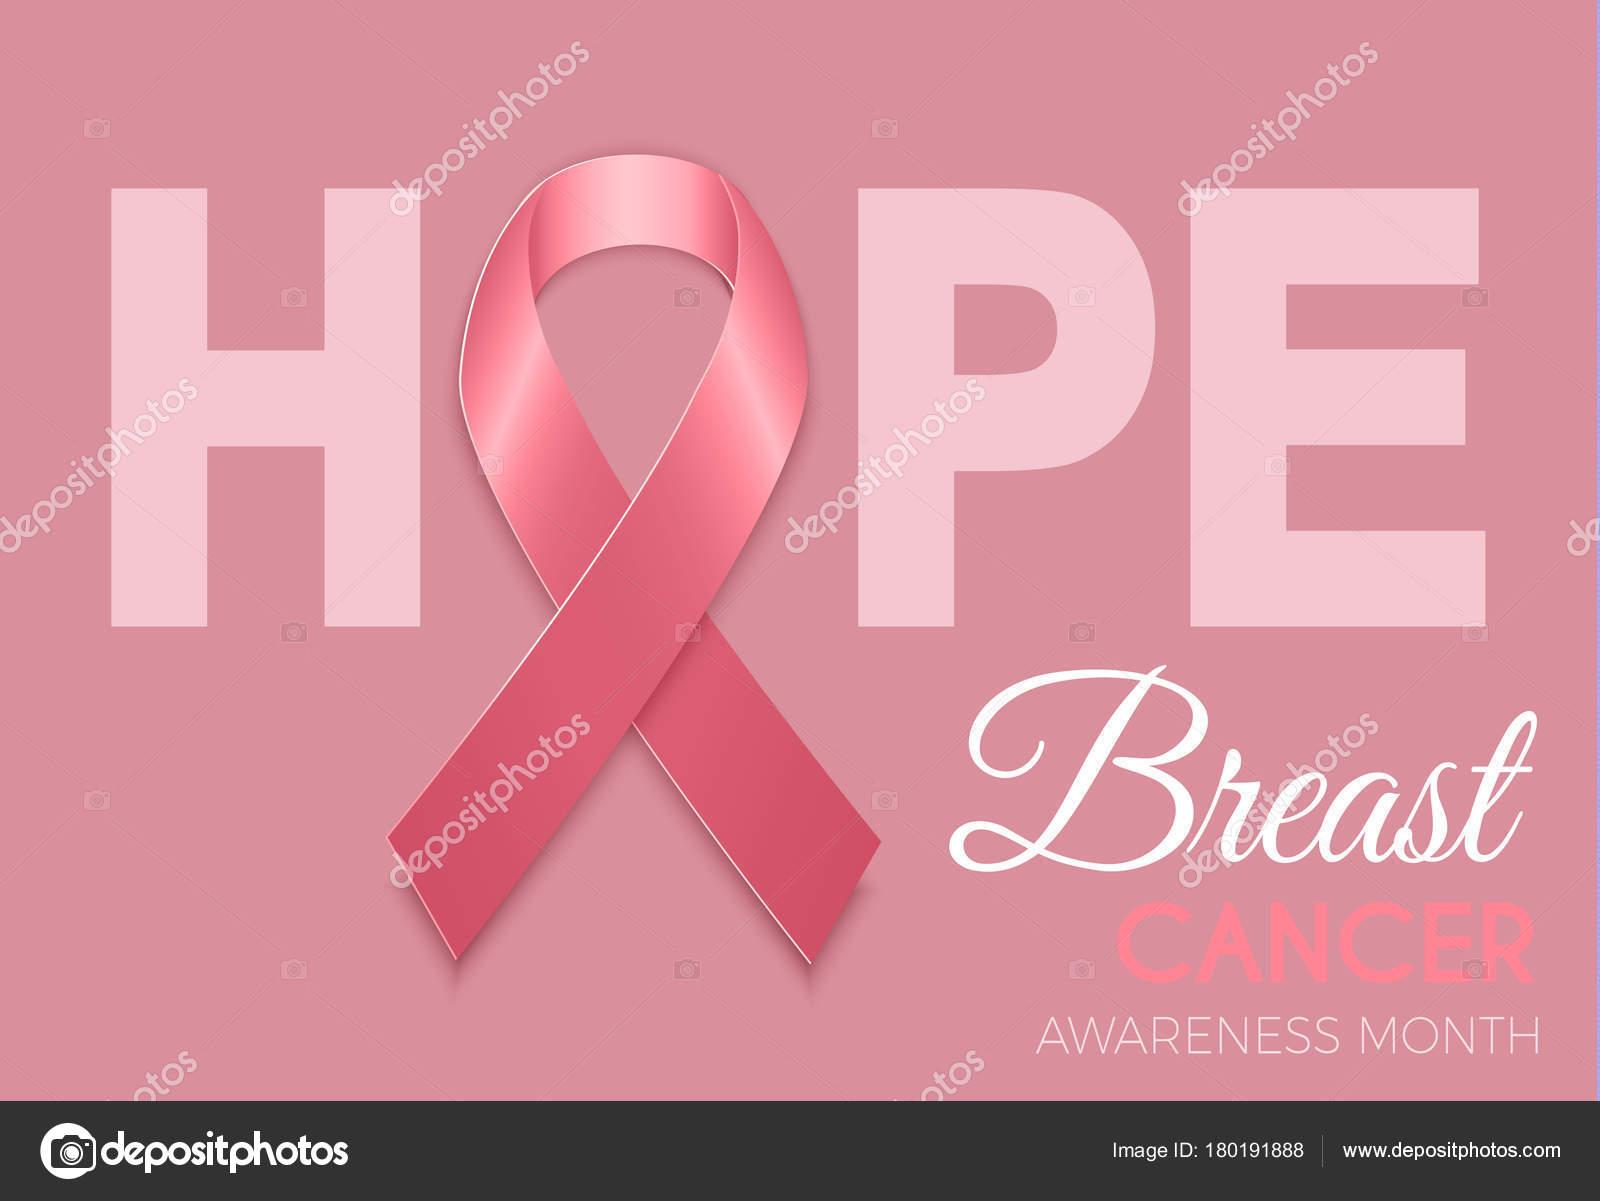 Breast cancer awareness month symbol emblem with pink ribbon si breast cancer awareness month symbol emblem with pink ribbon si stock vector biocorpaavc Choice Image